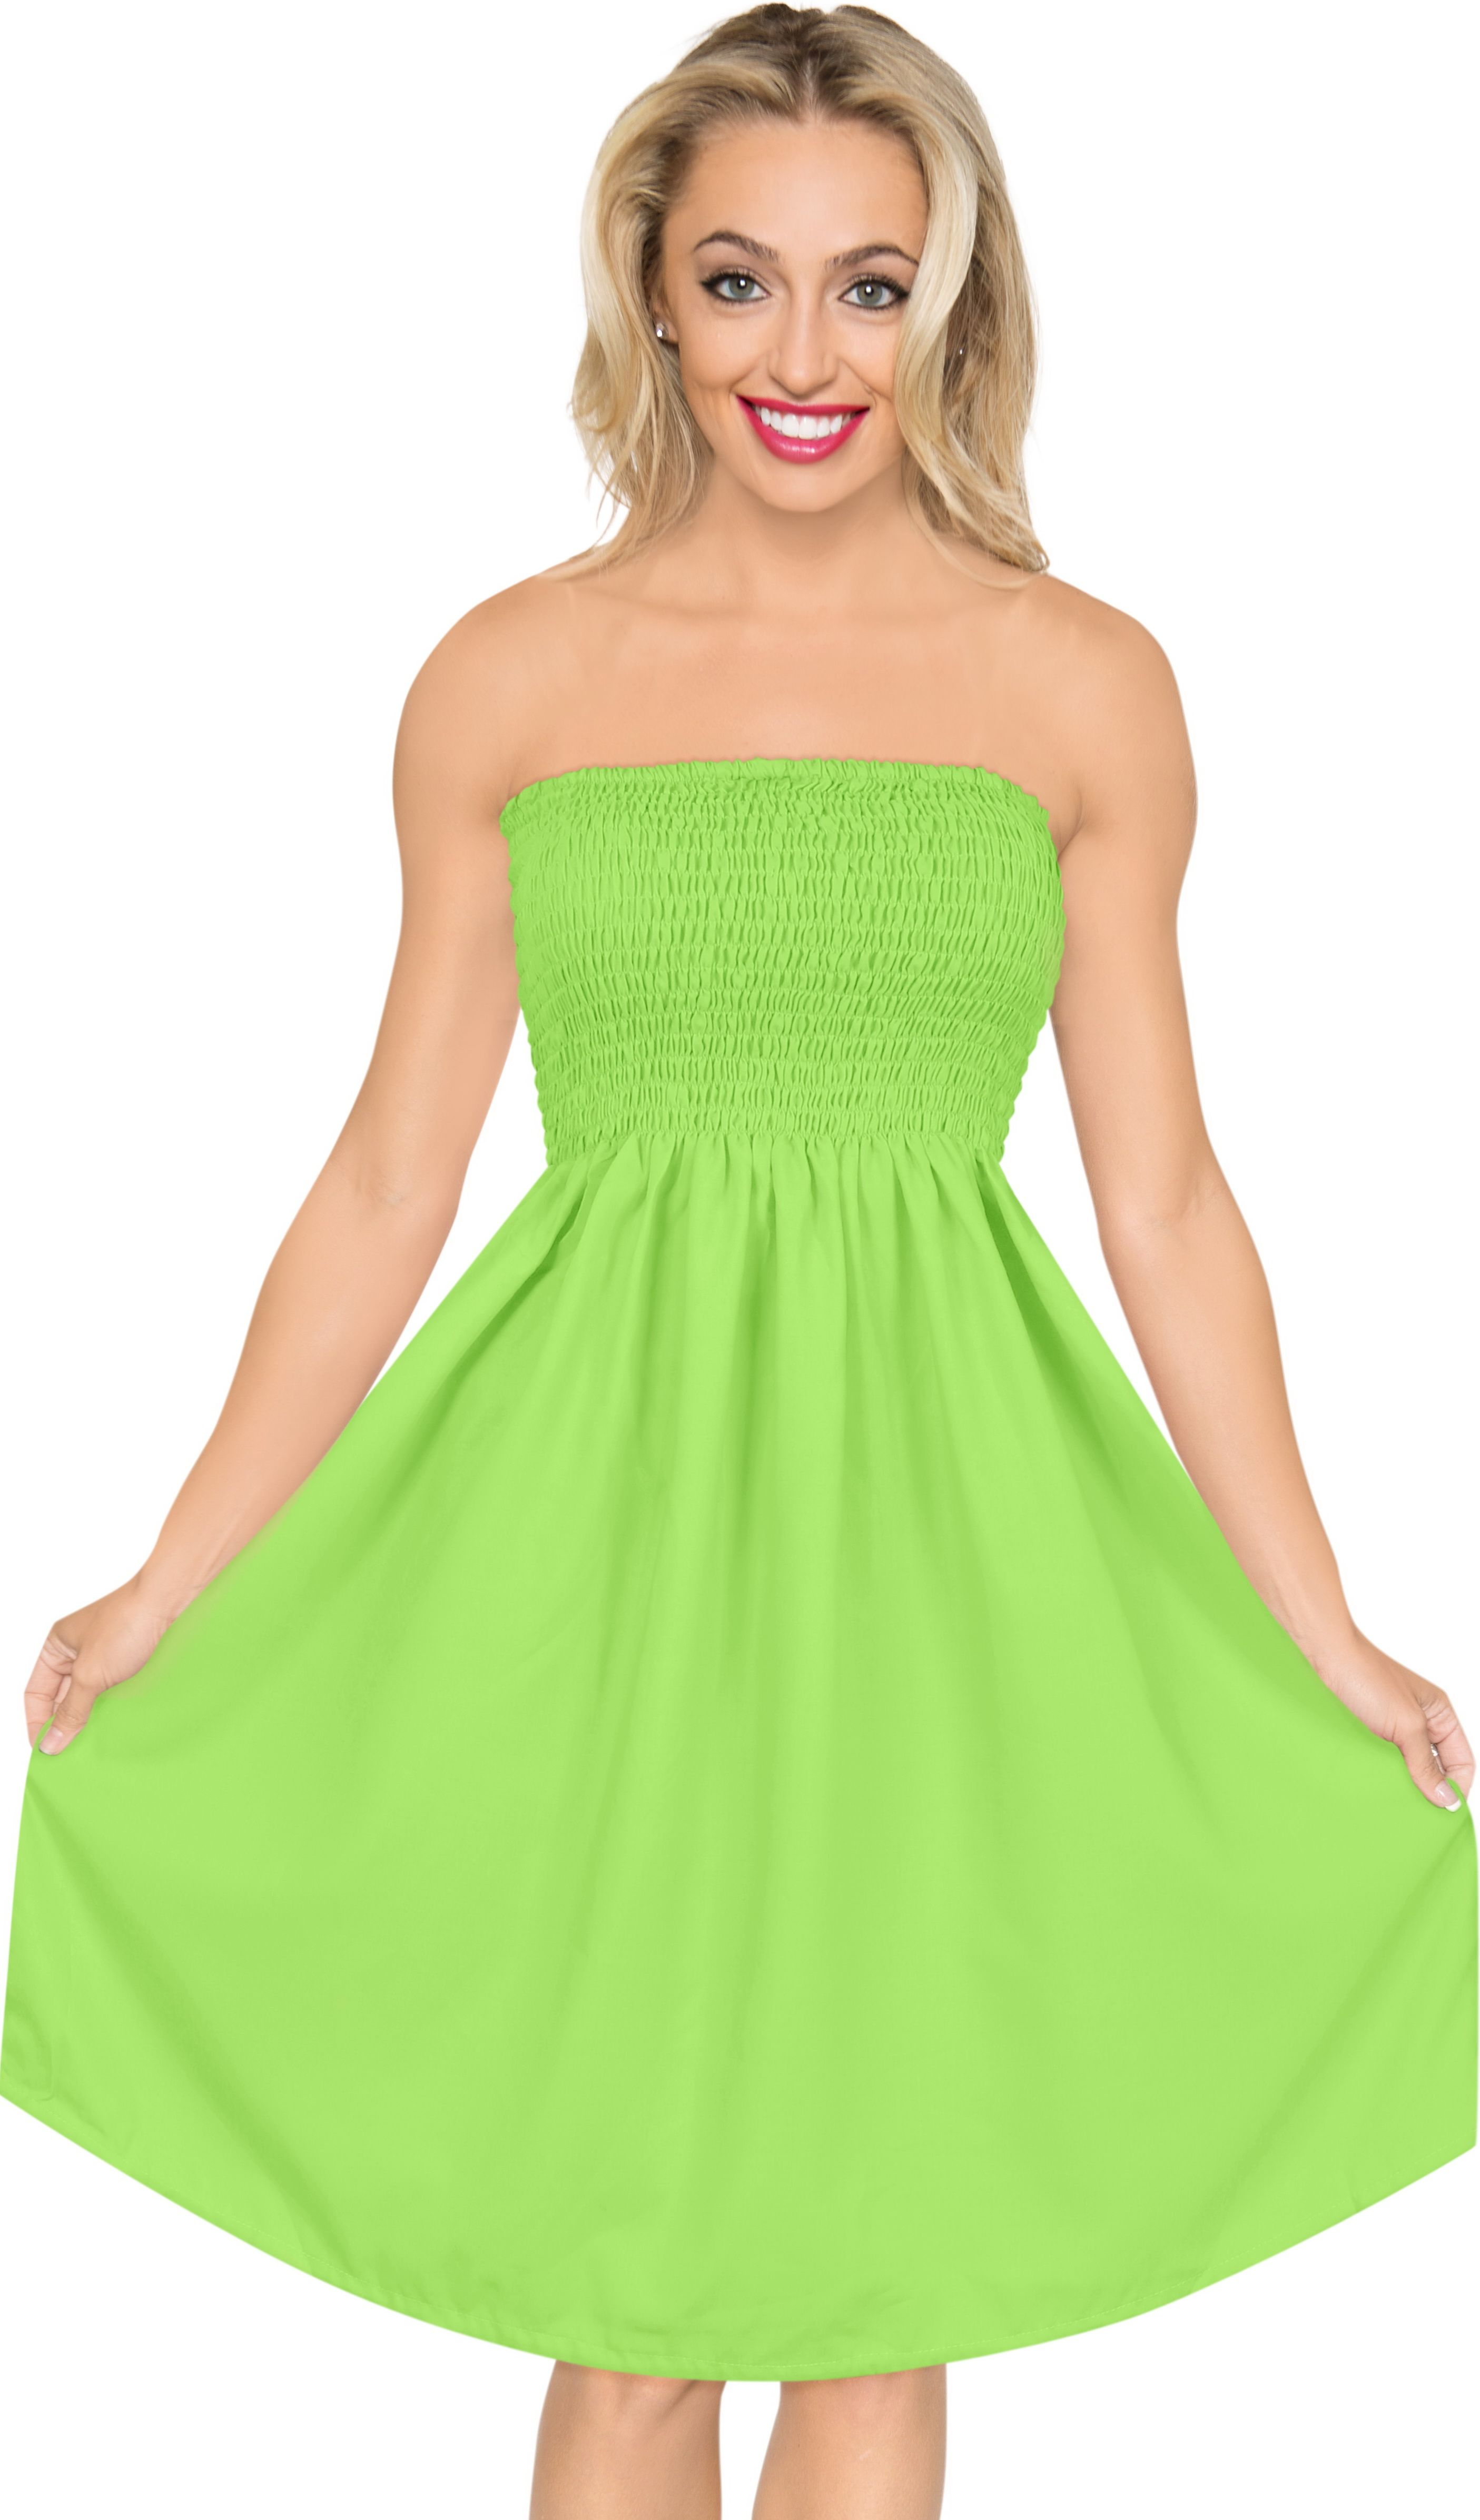 df33e404b43bd Evening Beach Tube Dress Maxi Skirt Backless Sundress Halter Boho ...